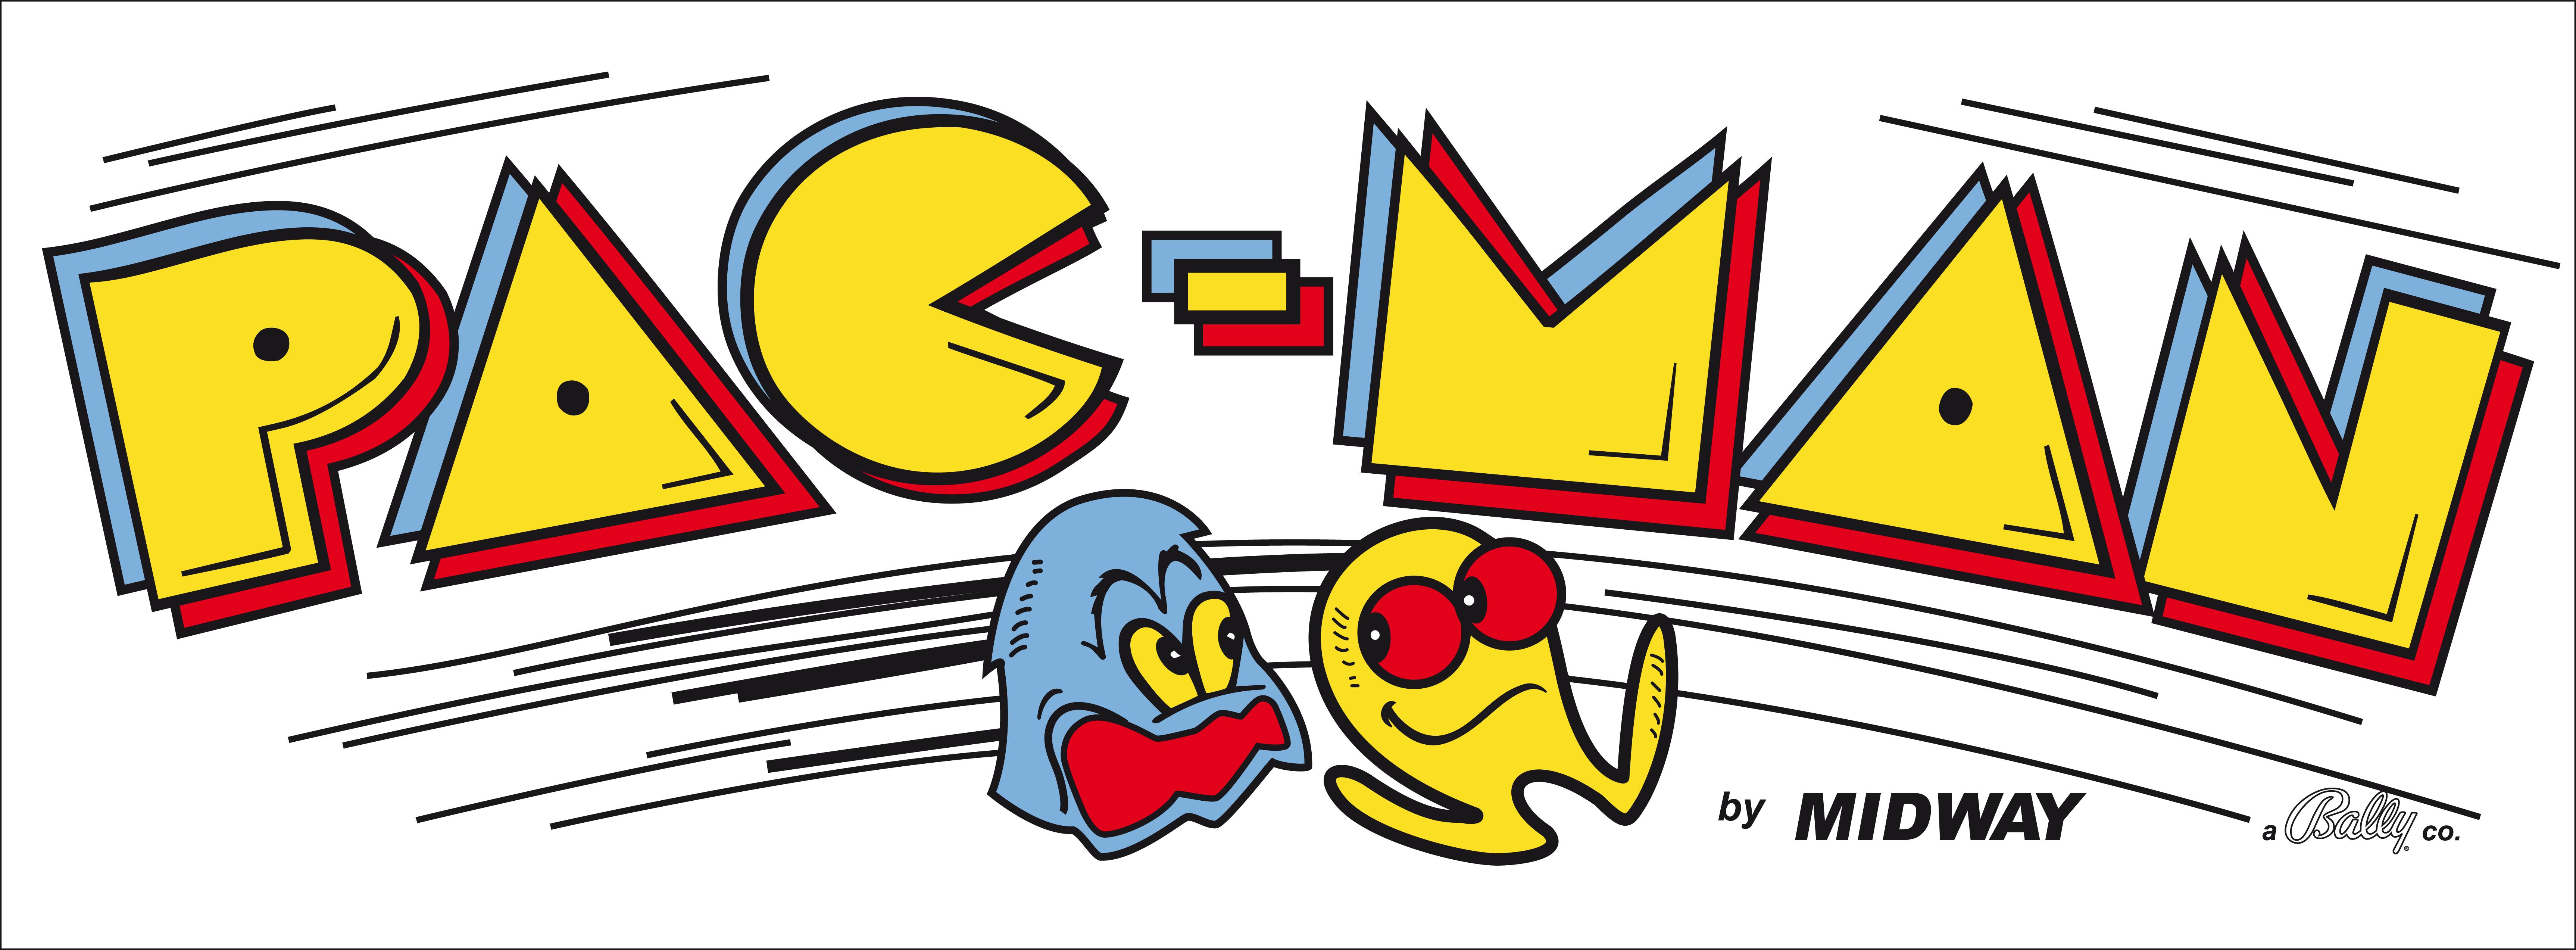 pacman logo - photo #14